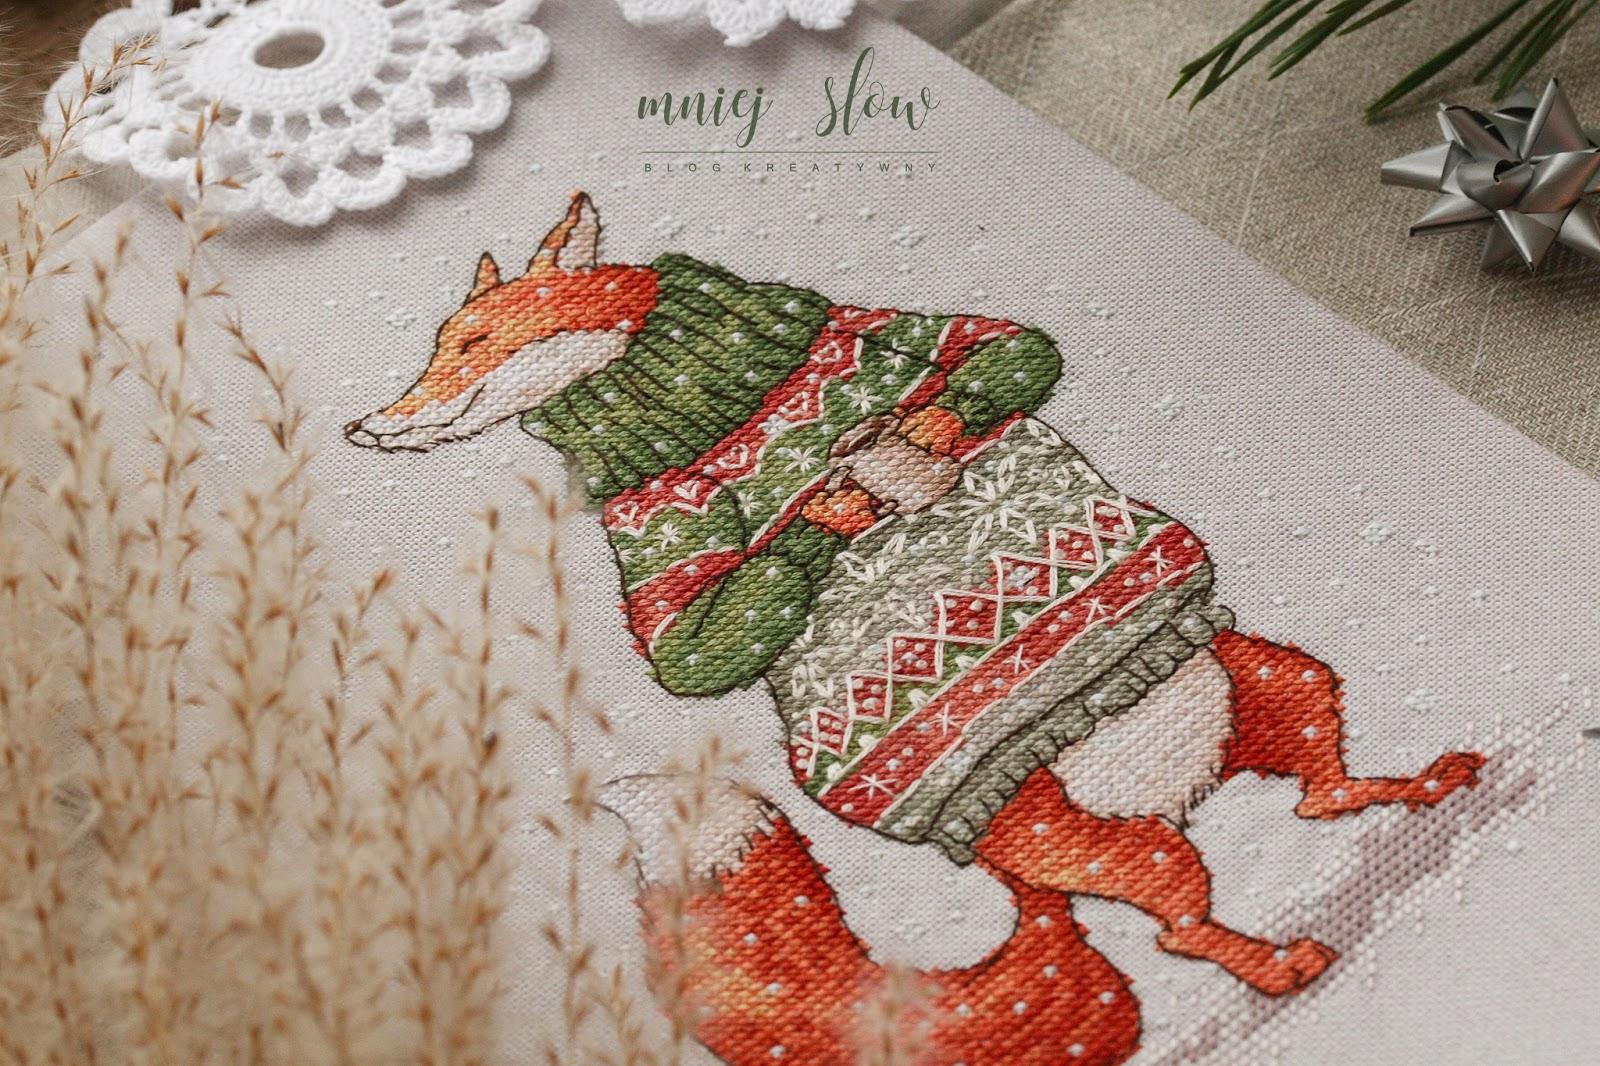 Lis w sweterku - Ekaterina Gafenko #2